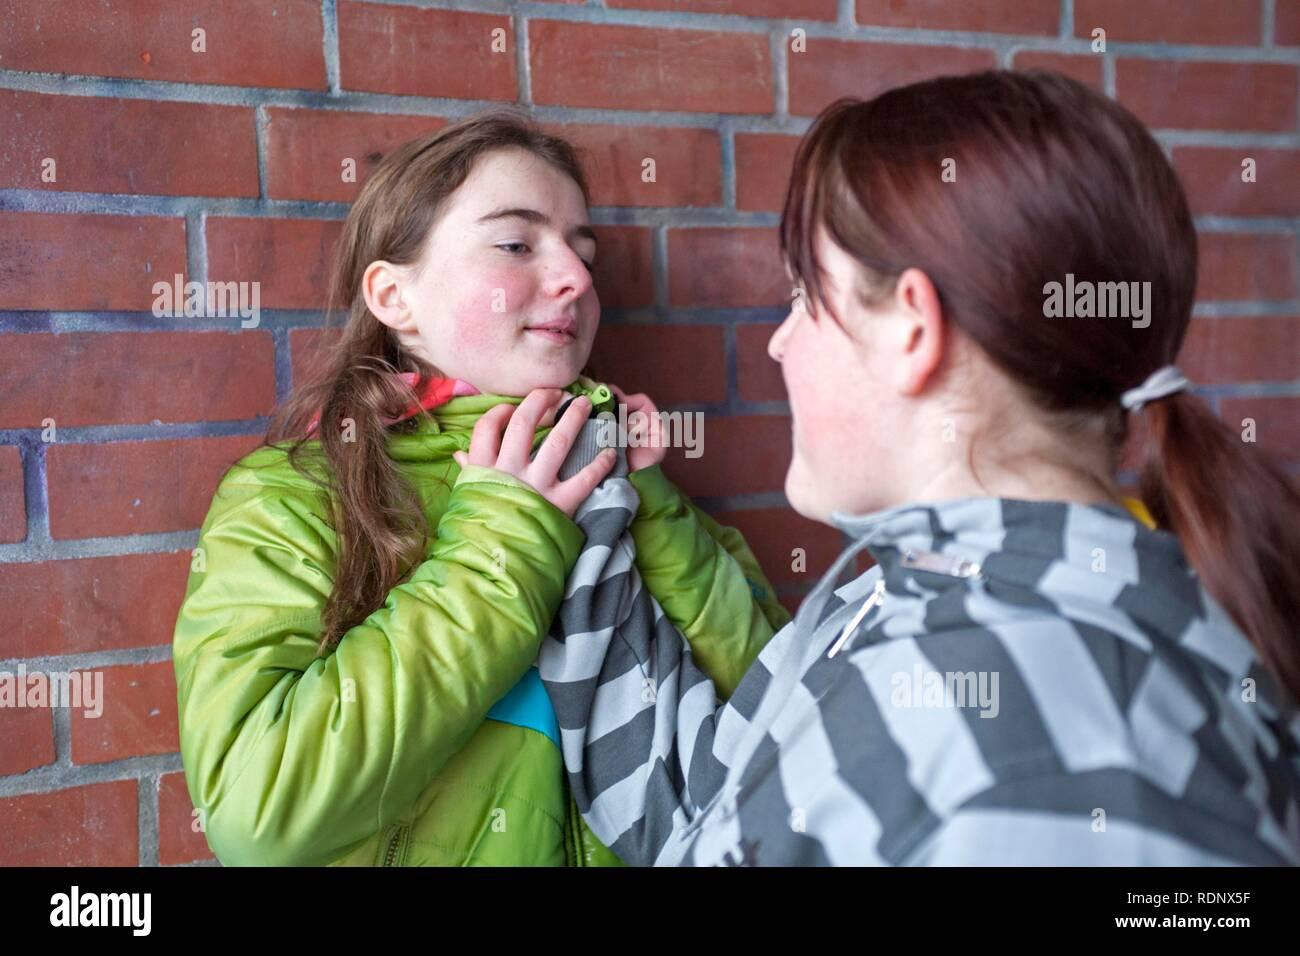 Girl pushing a smaller girl brutally against a wall, posed scene - Stock Image